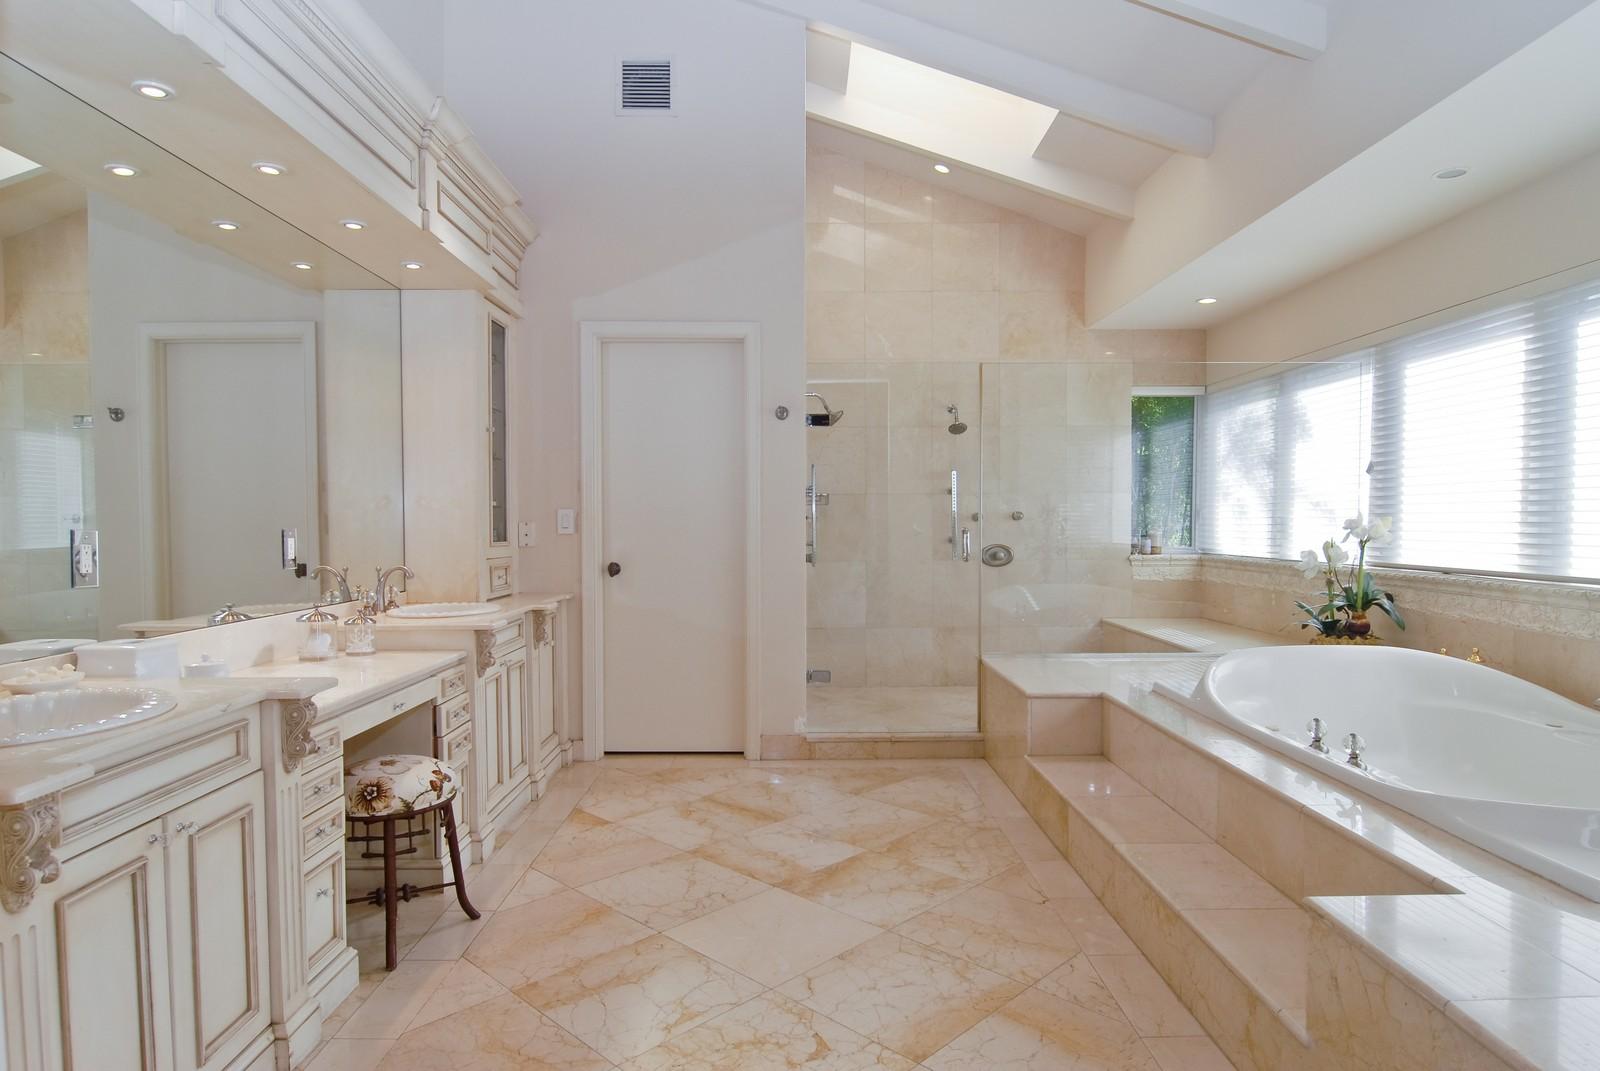 Real Estate Photography - 4845 Davis Rd, Miami, FL, 33143 - Master Bathroom